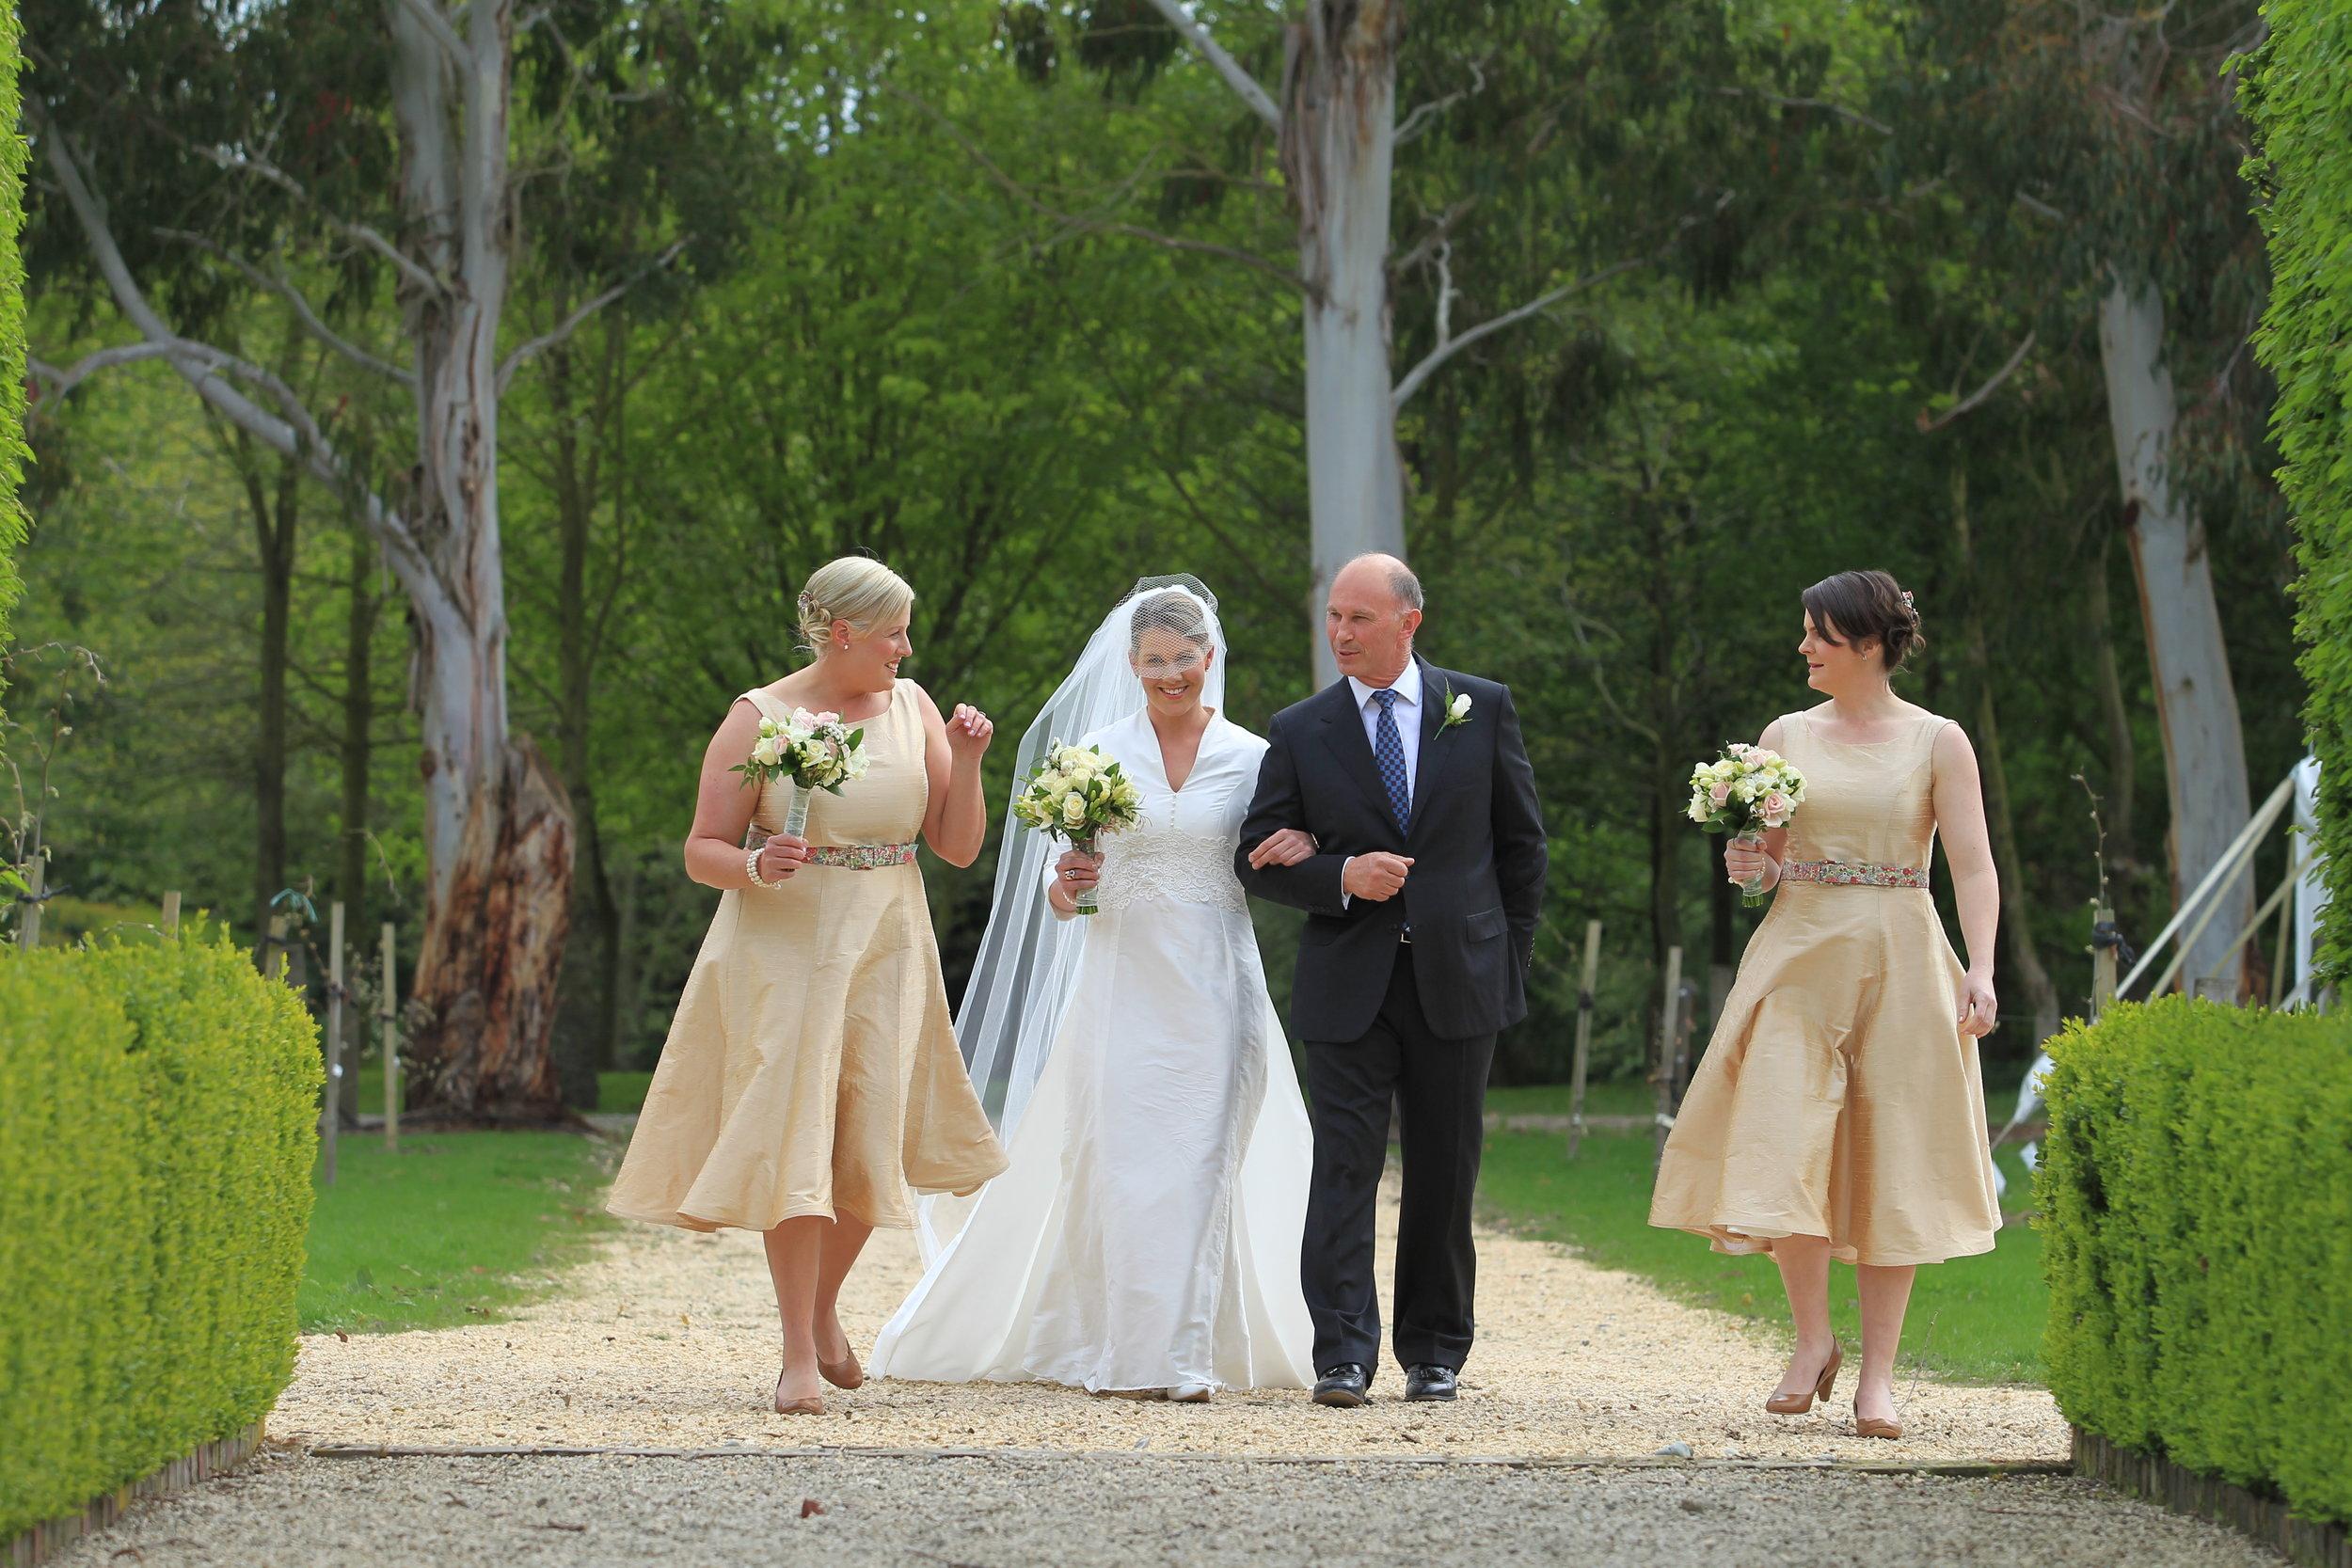 v - silk dupion - Christchurch bridal